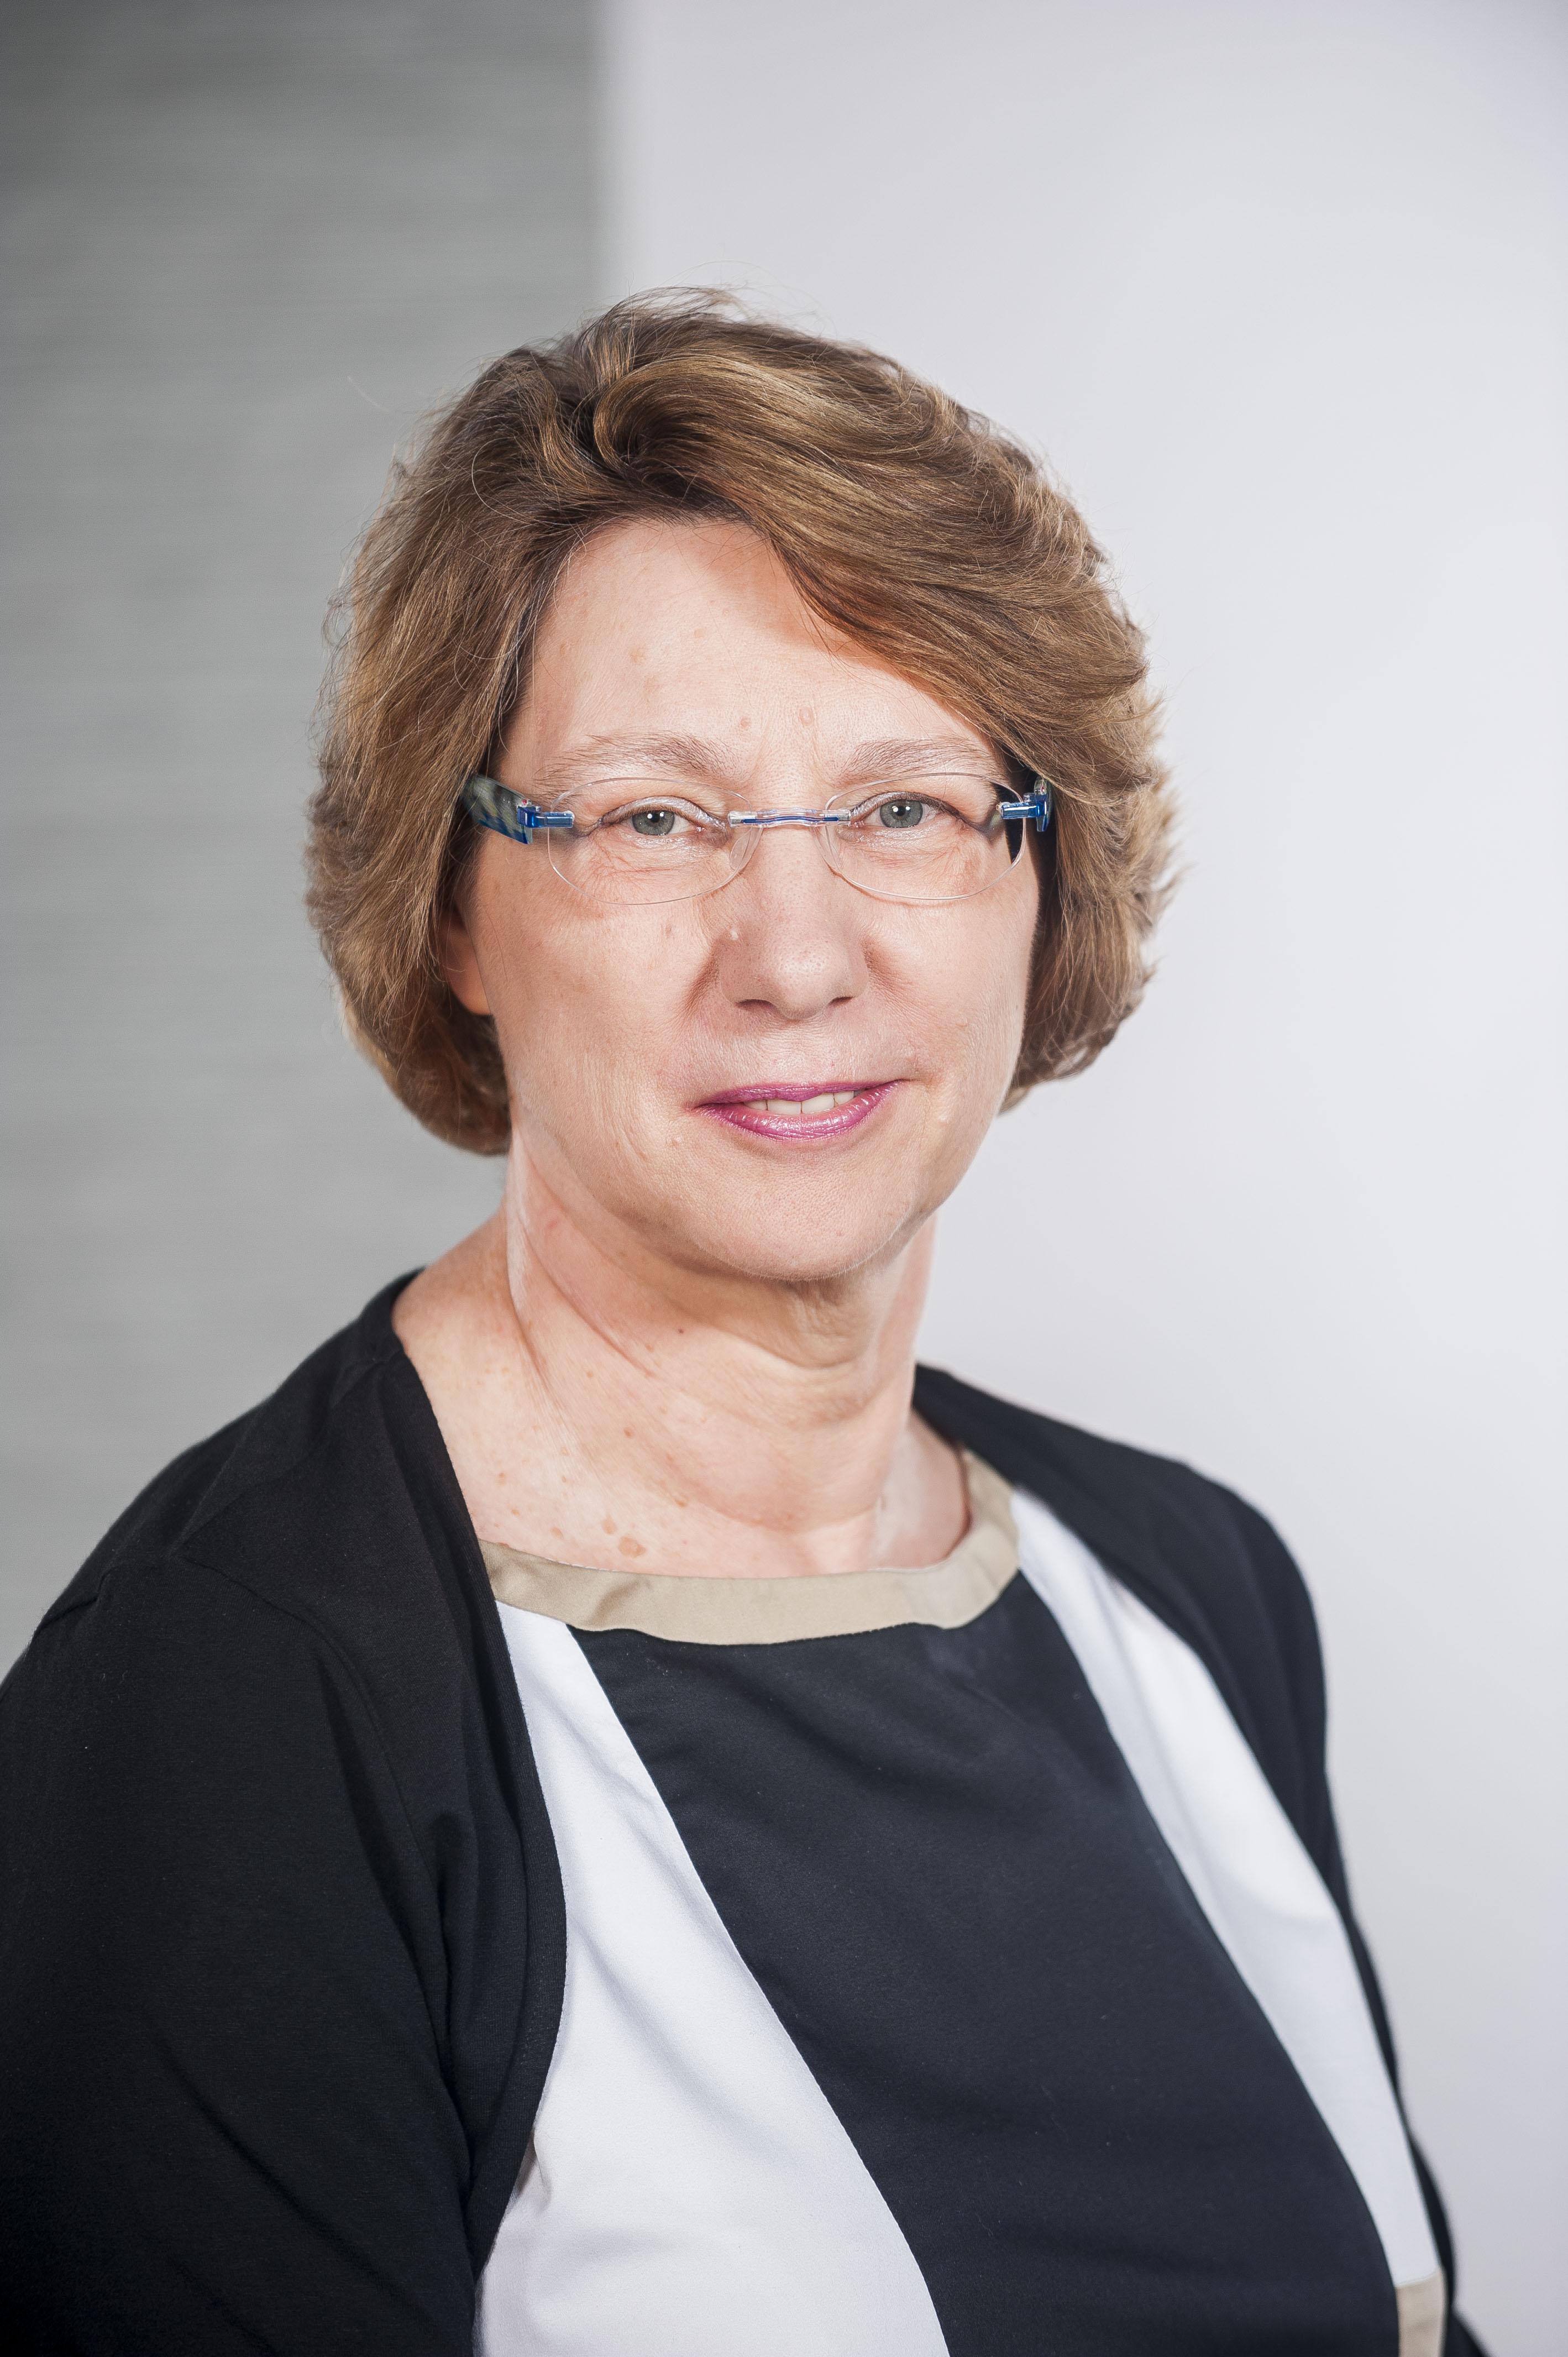 Dr. Helga Leonhard, TÜV SÜD Chemie Service